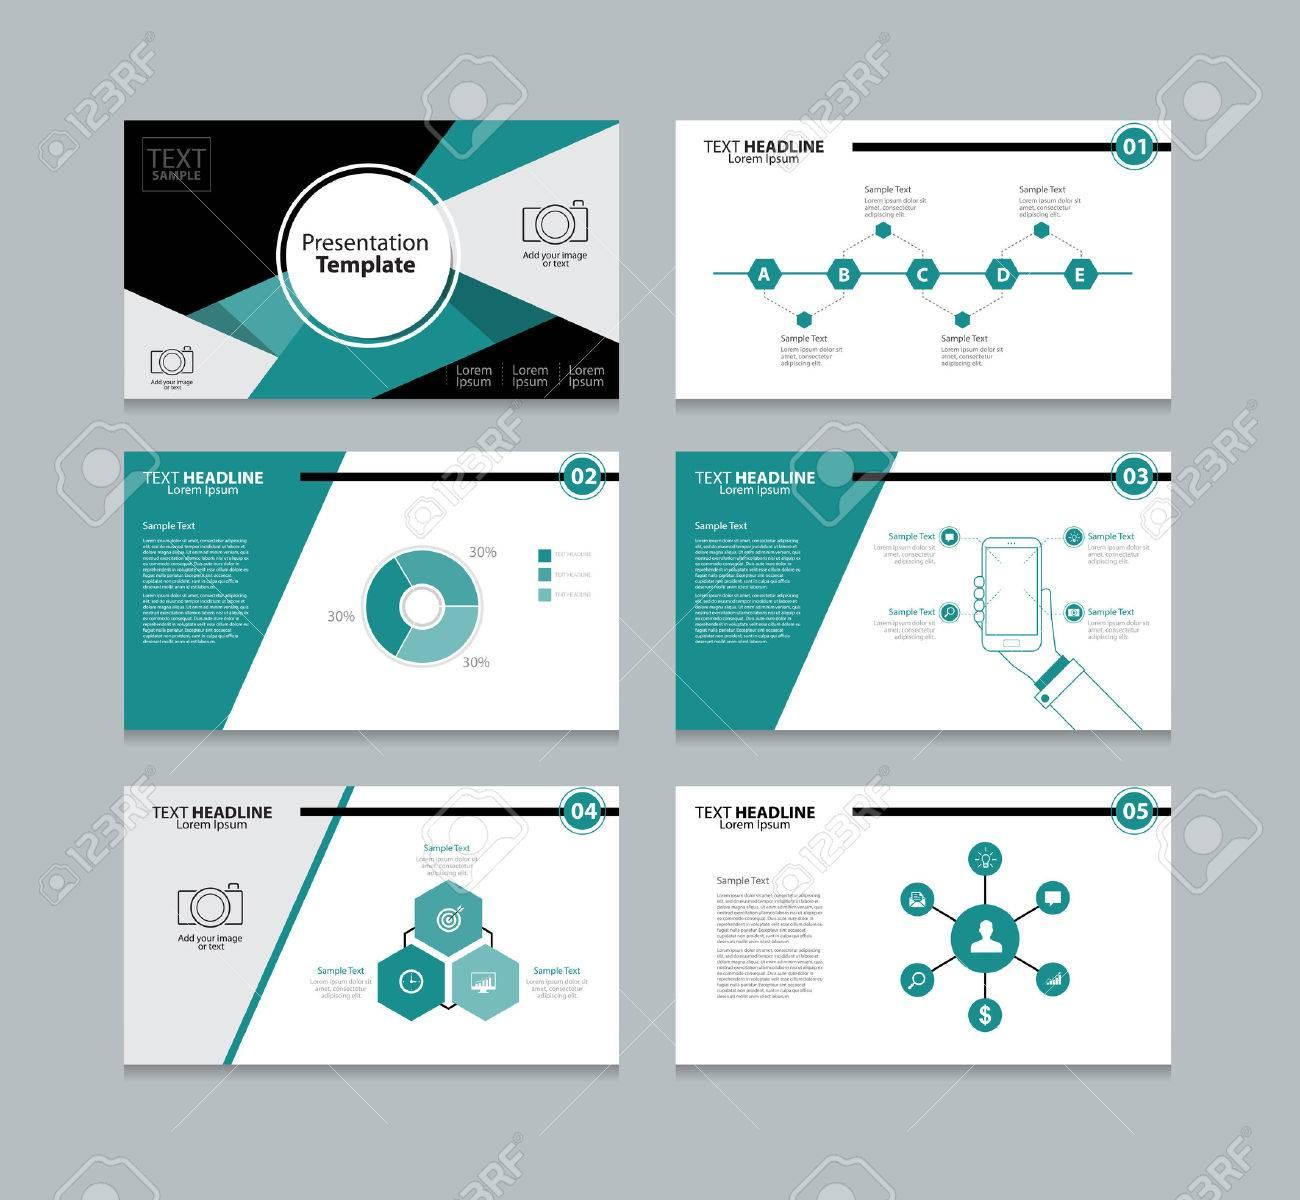 vector template presentation slides background design royalty free